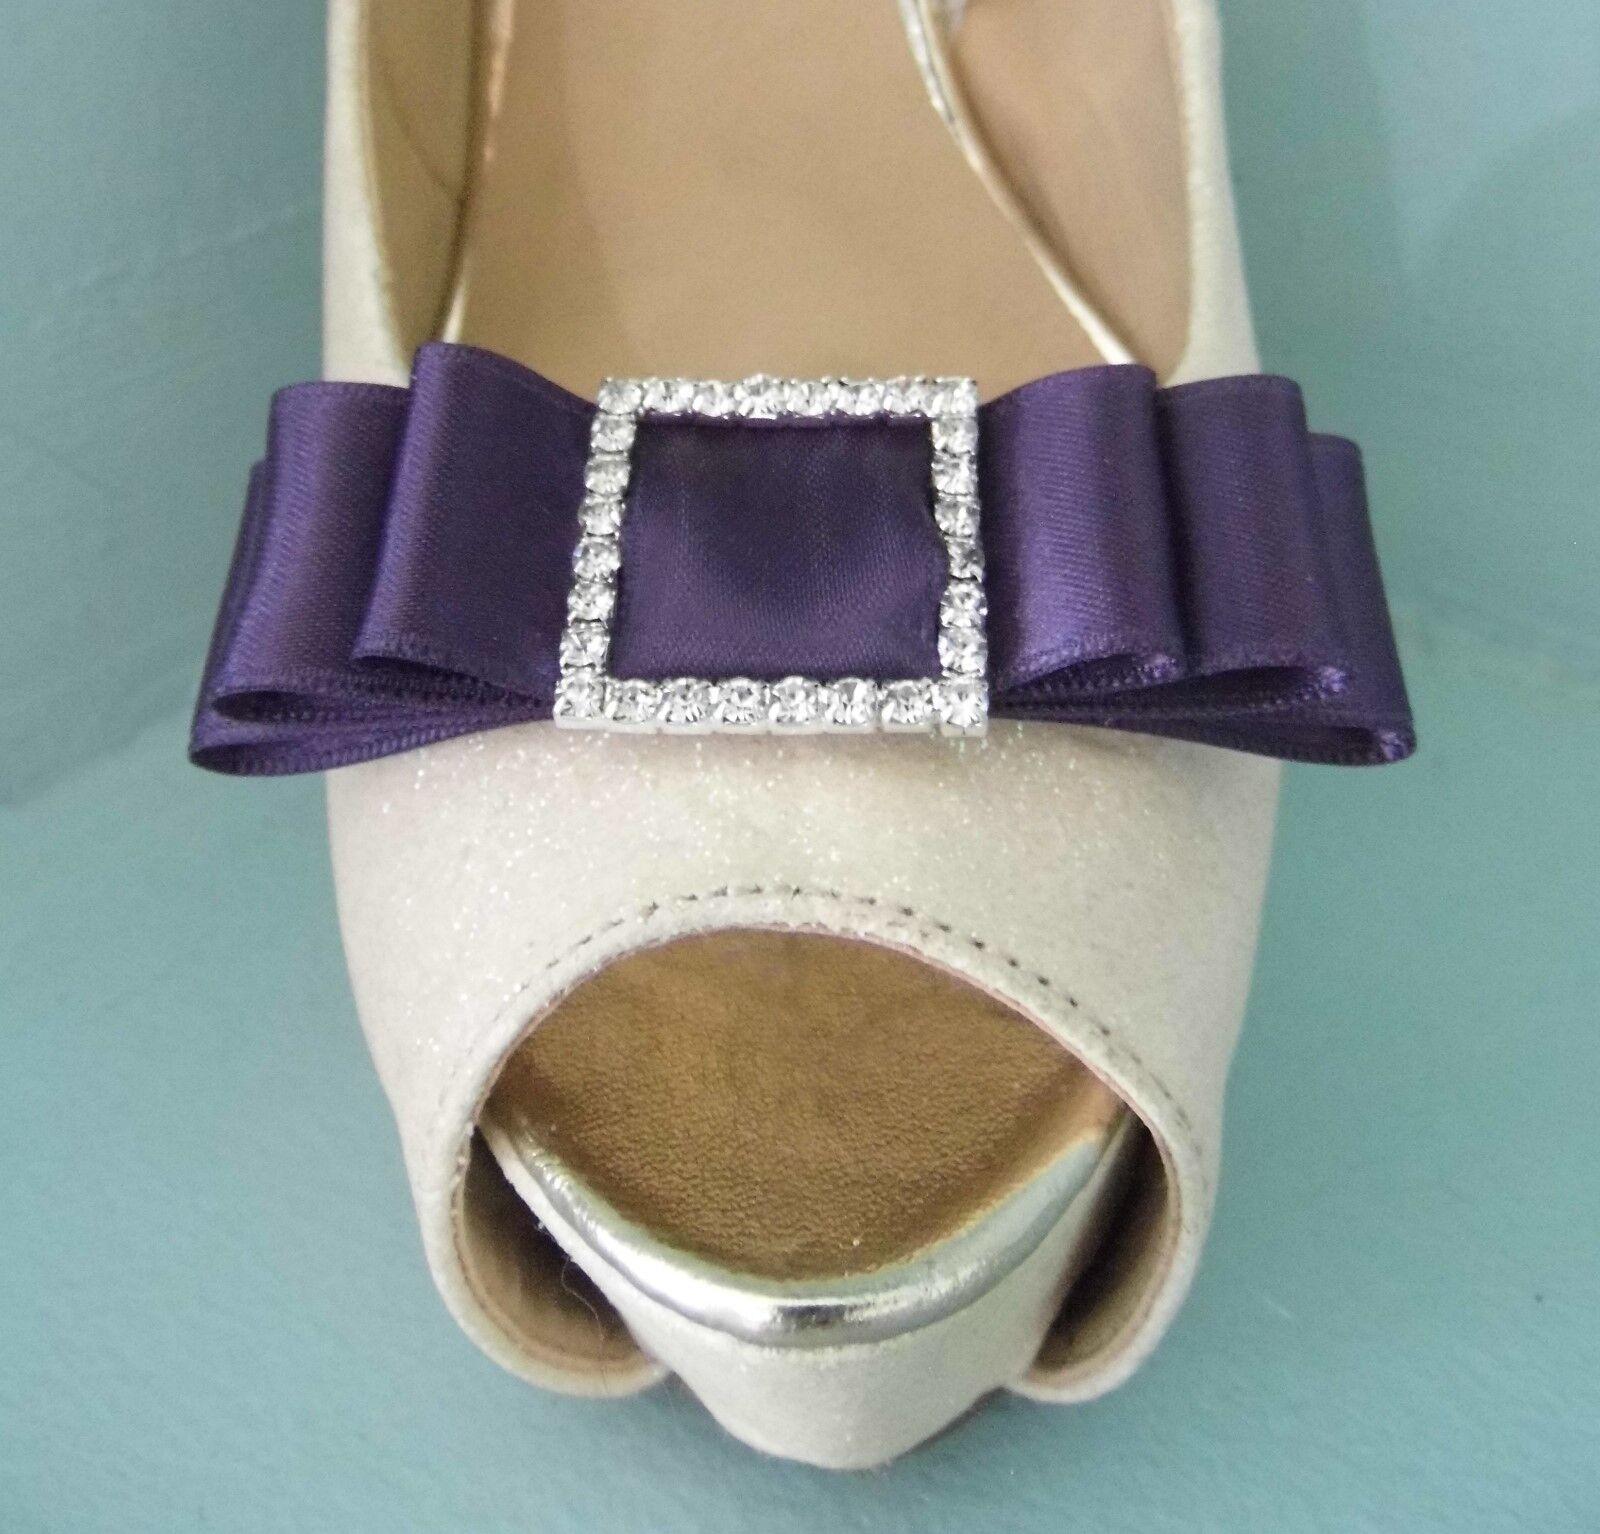 2 Handmade Plum Satin Bow Shoe Clips with Diamante Buckle Centre